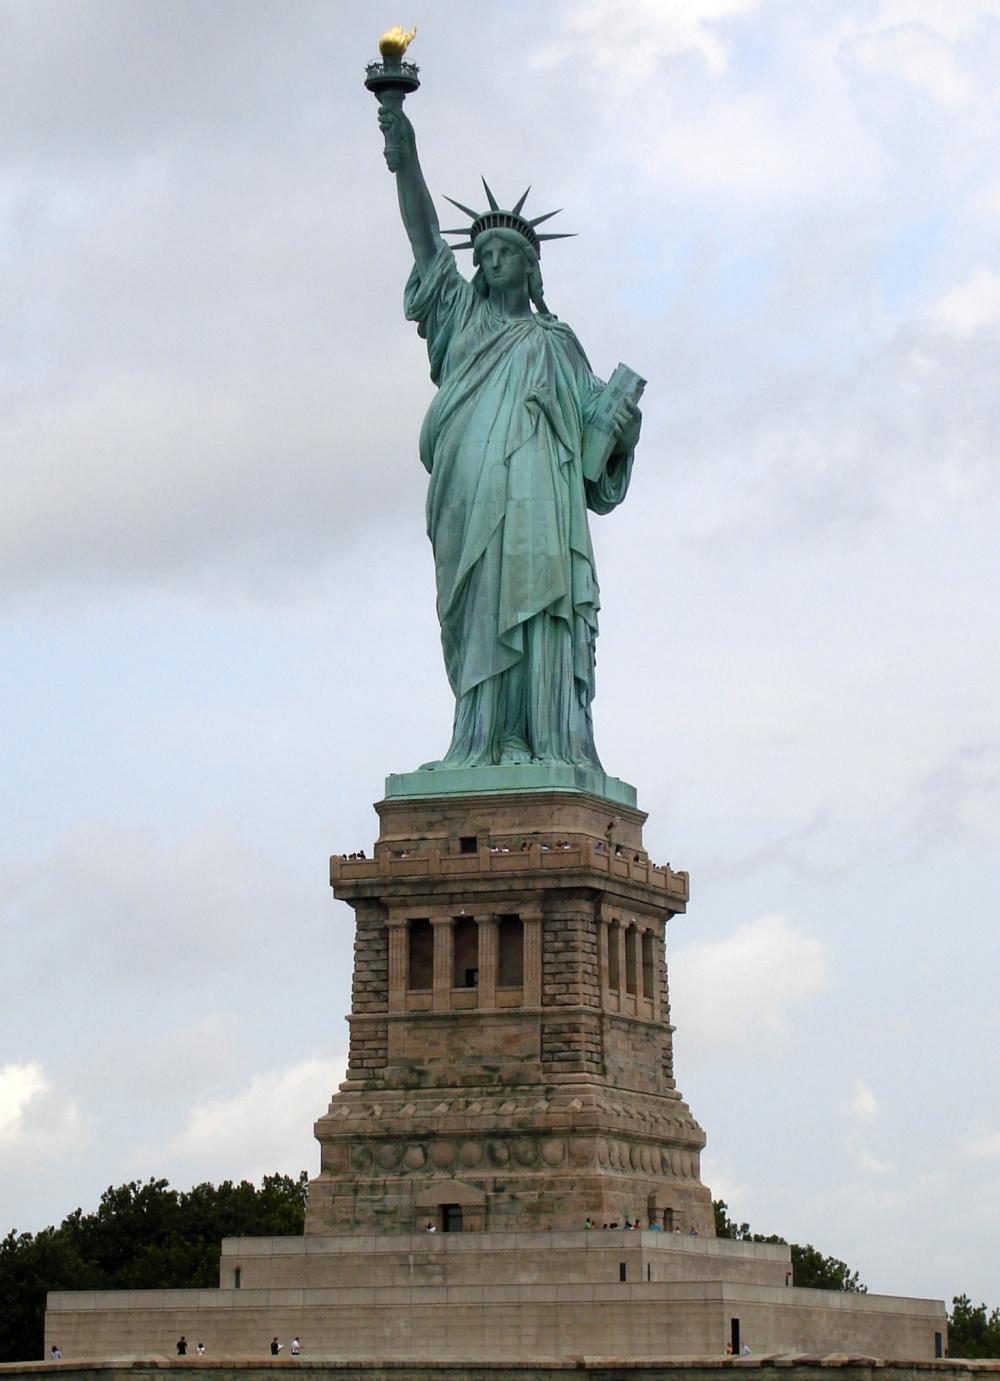 Statue_of_Liberty_7.jpg